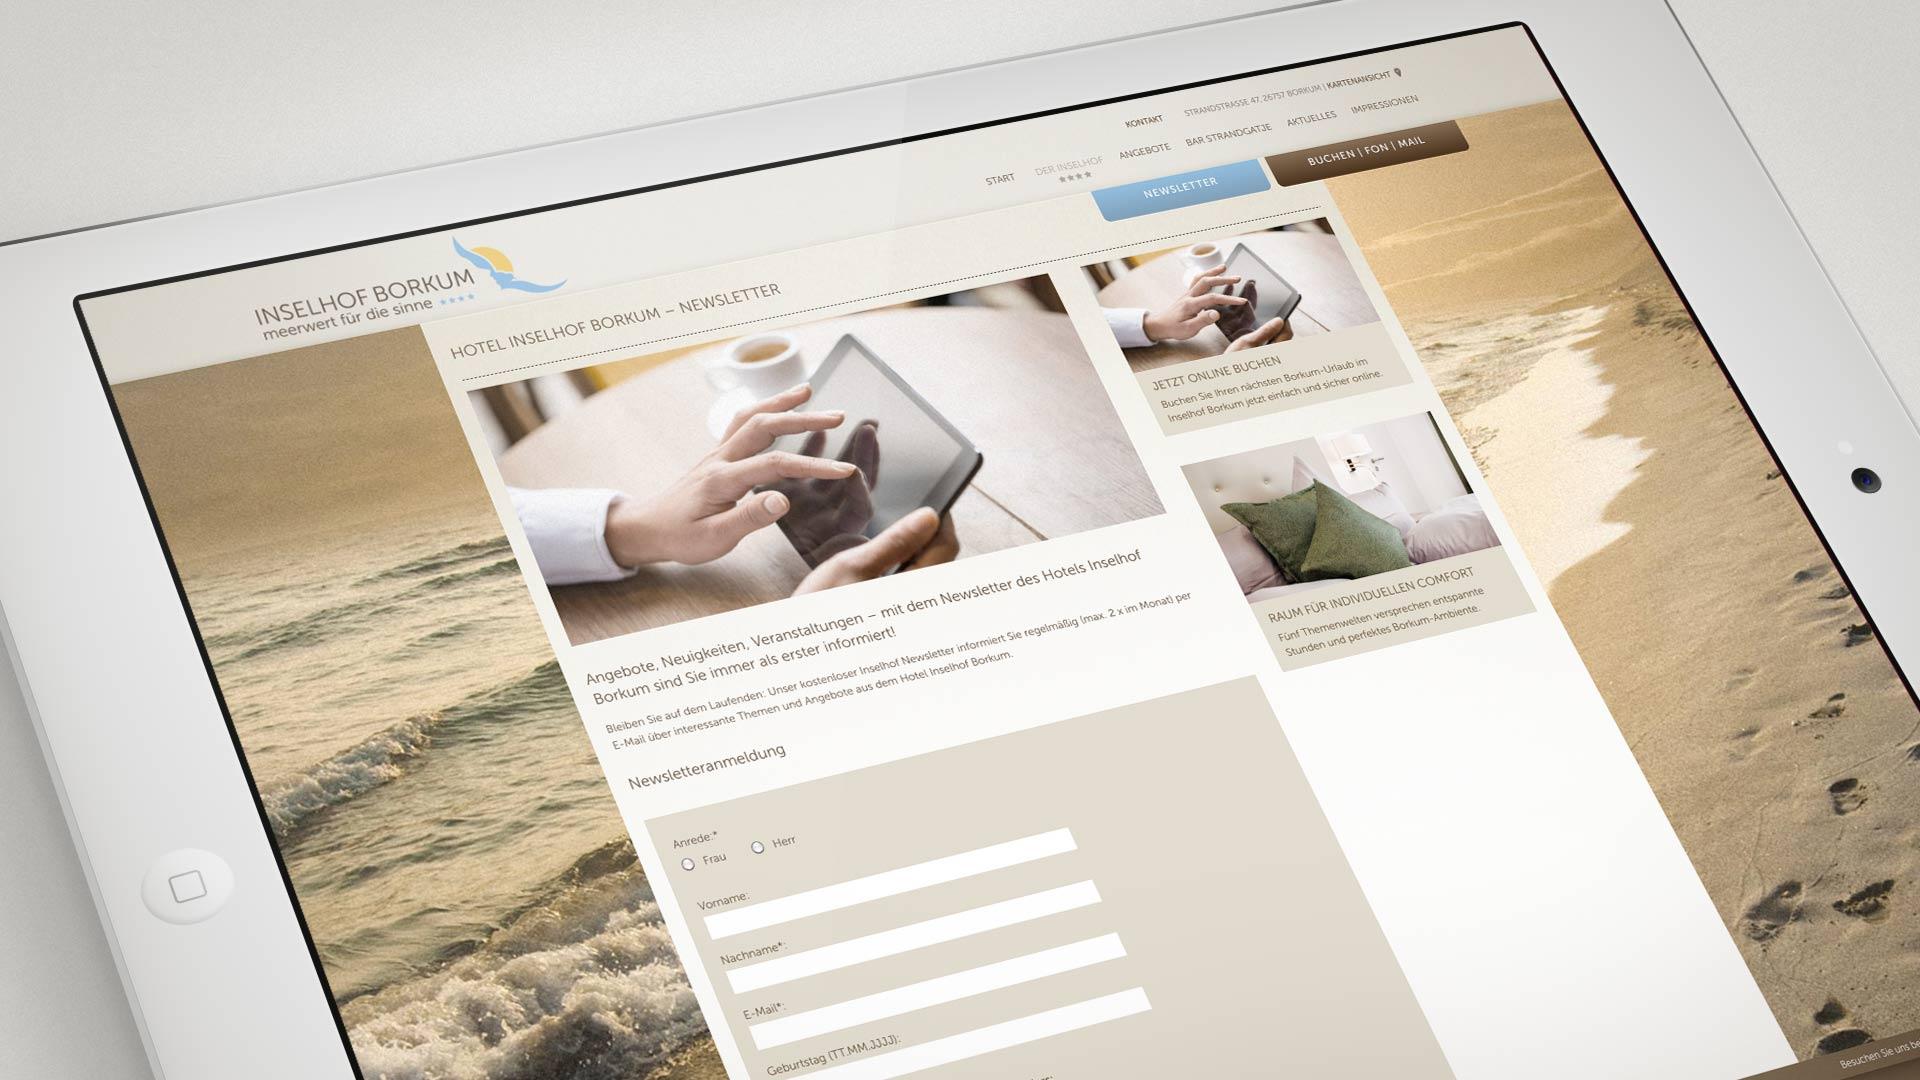 artventura-Projekt Webentwicklung inselhof-borkum.de:Darstellung der Newsletter-Anmeldung